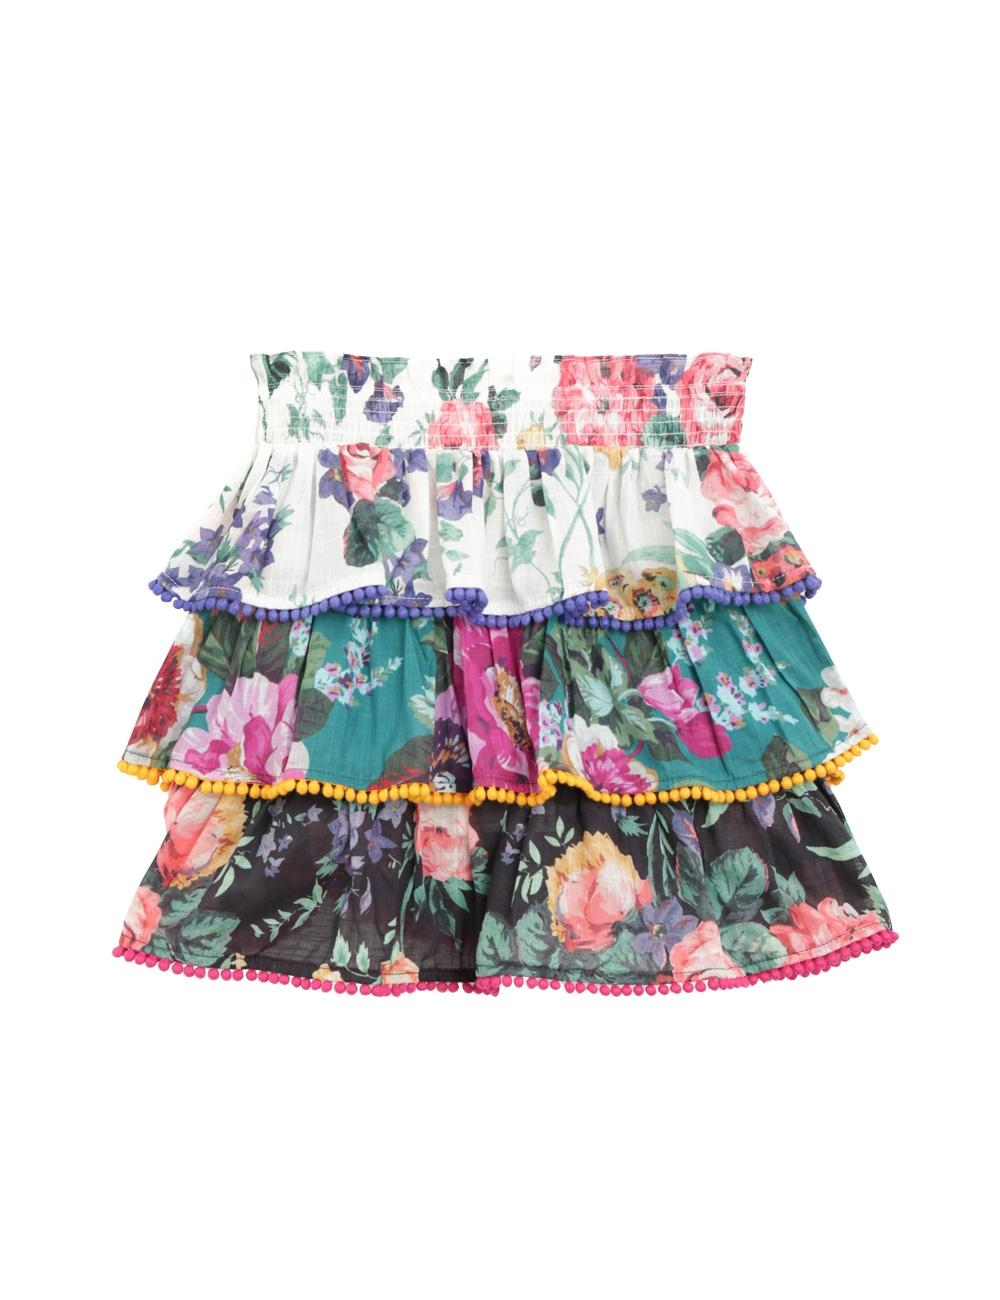 Allia Tiered Skirt